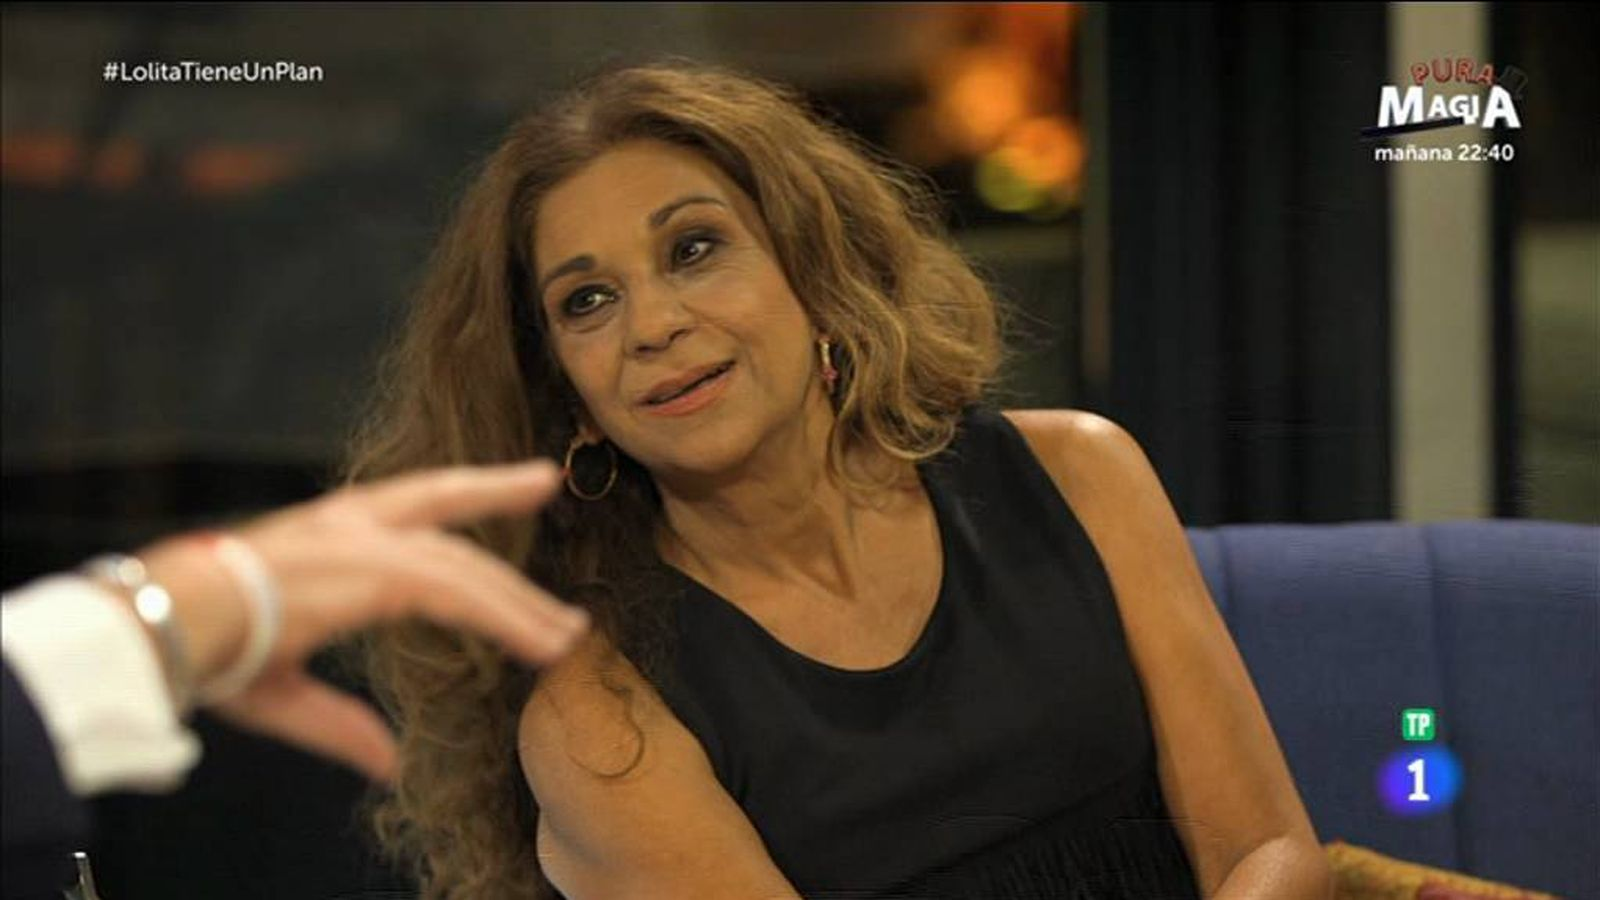 Foto: Lolita Flores en 'Lolita tiene un plan'. (RTVE)